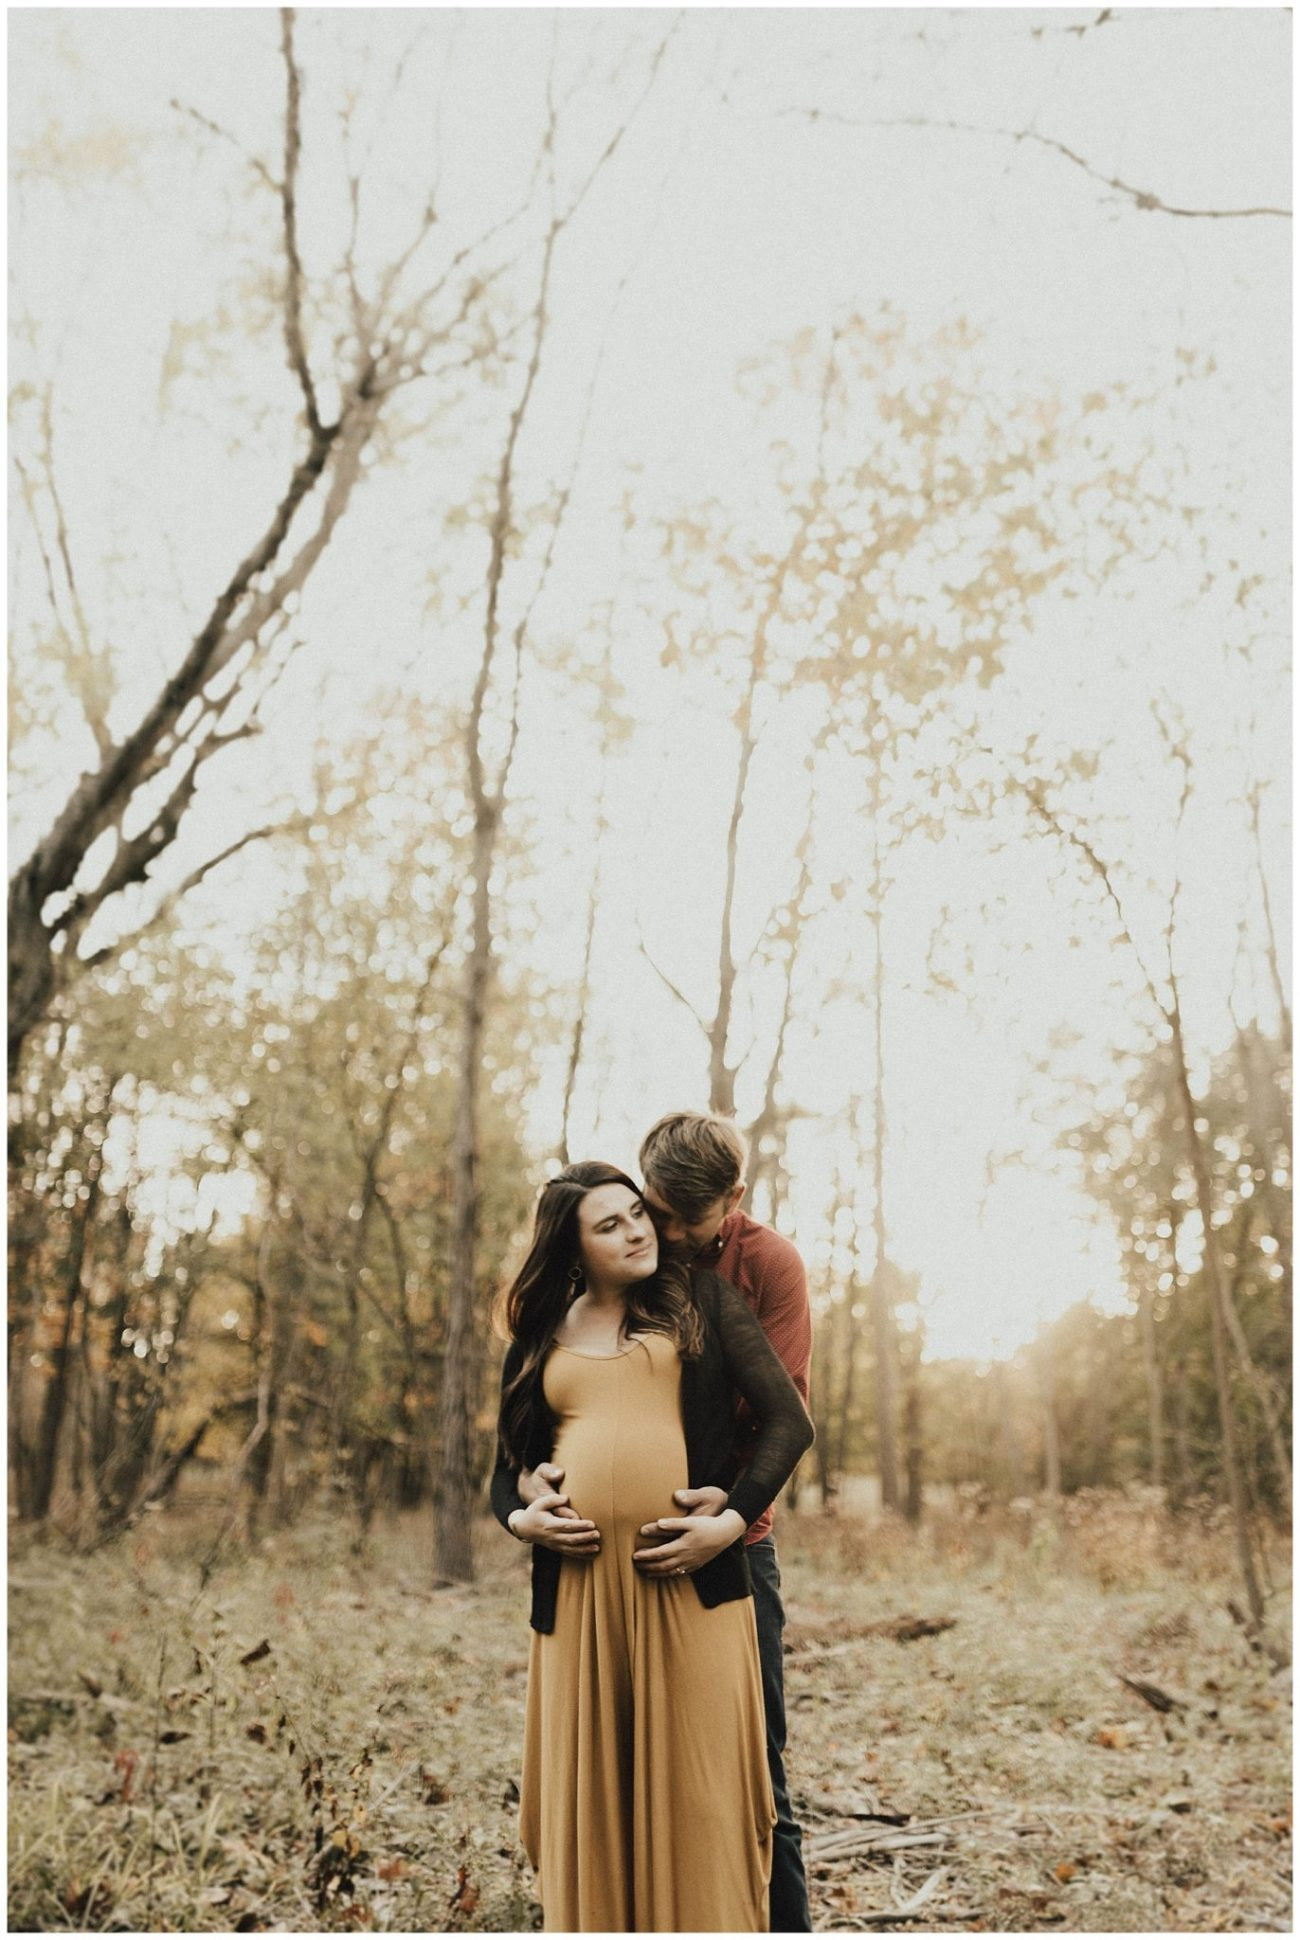 68053a7faac Craig + Joanna // Fall Maternity - Lauren F.otography | Central ...